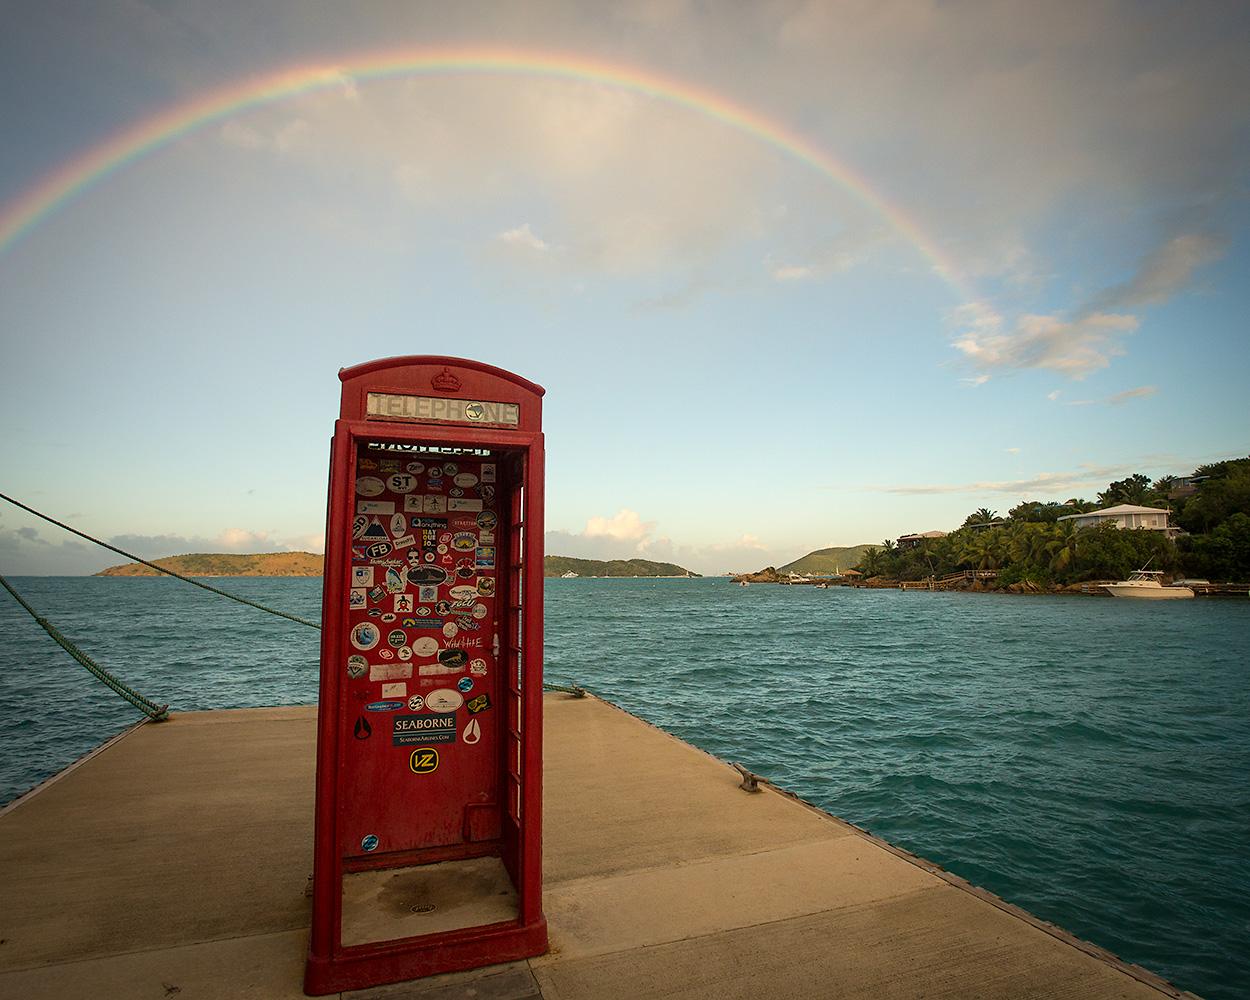 telephone_booth_rainbow.jpg